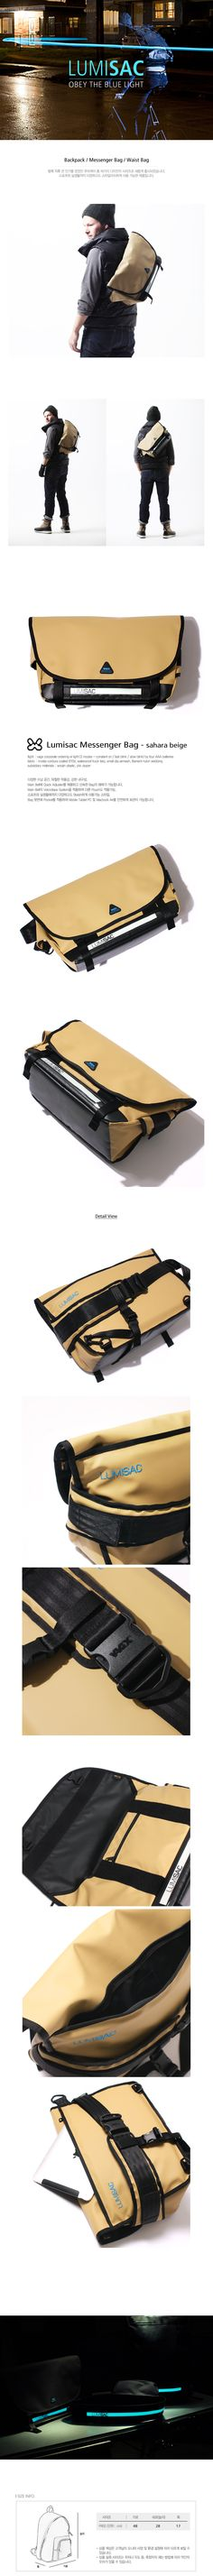 Lumisac Messenger Bag sahara beige